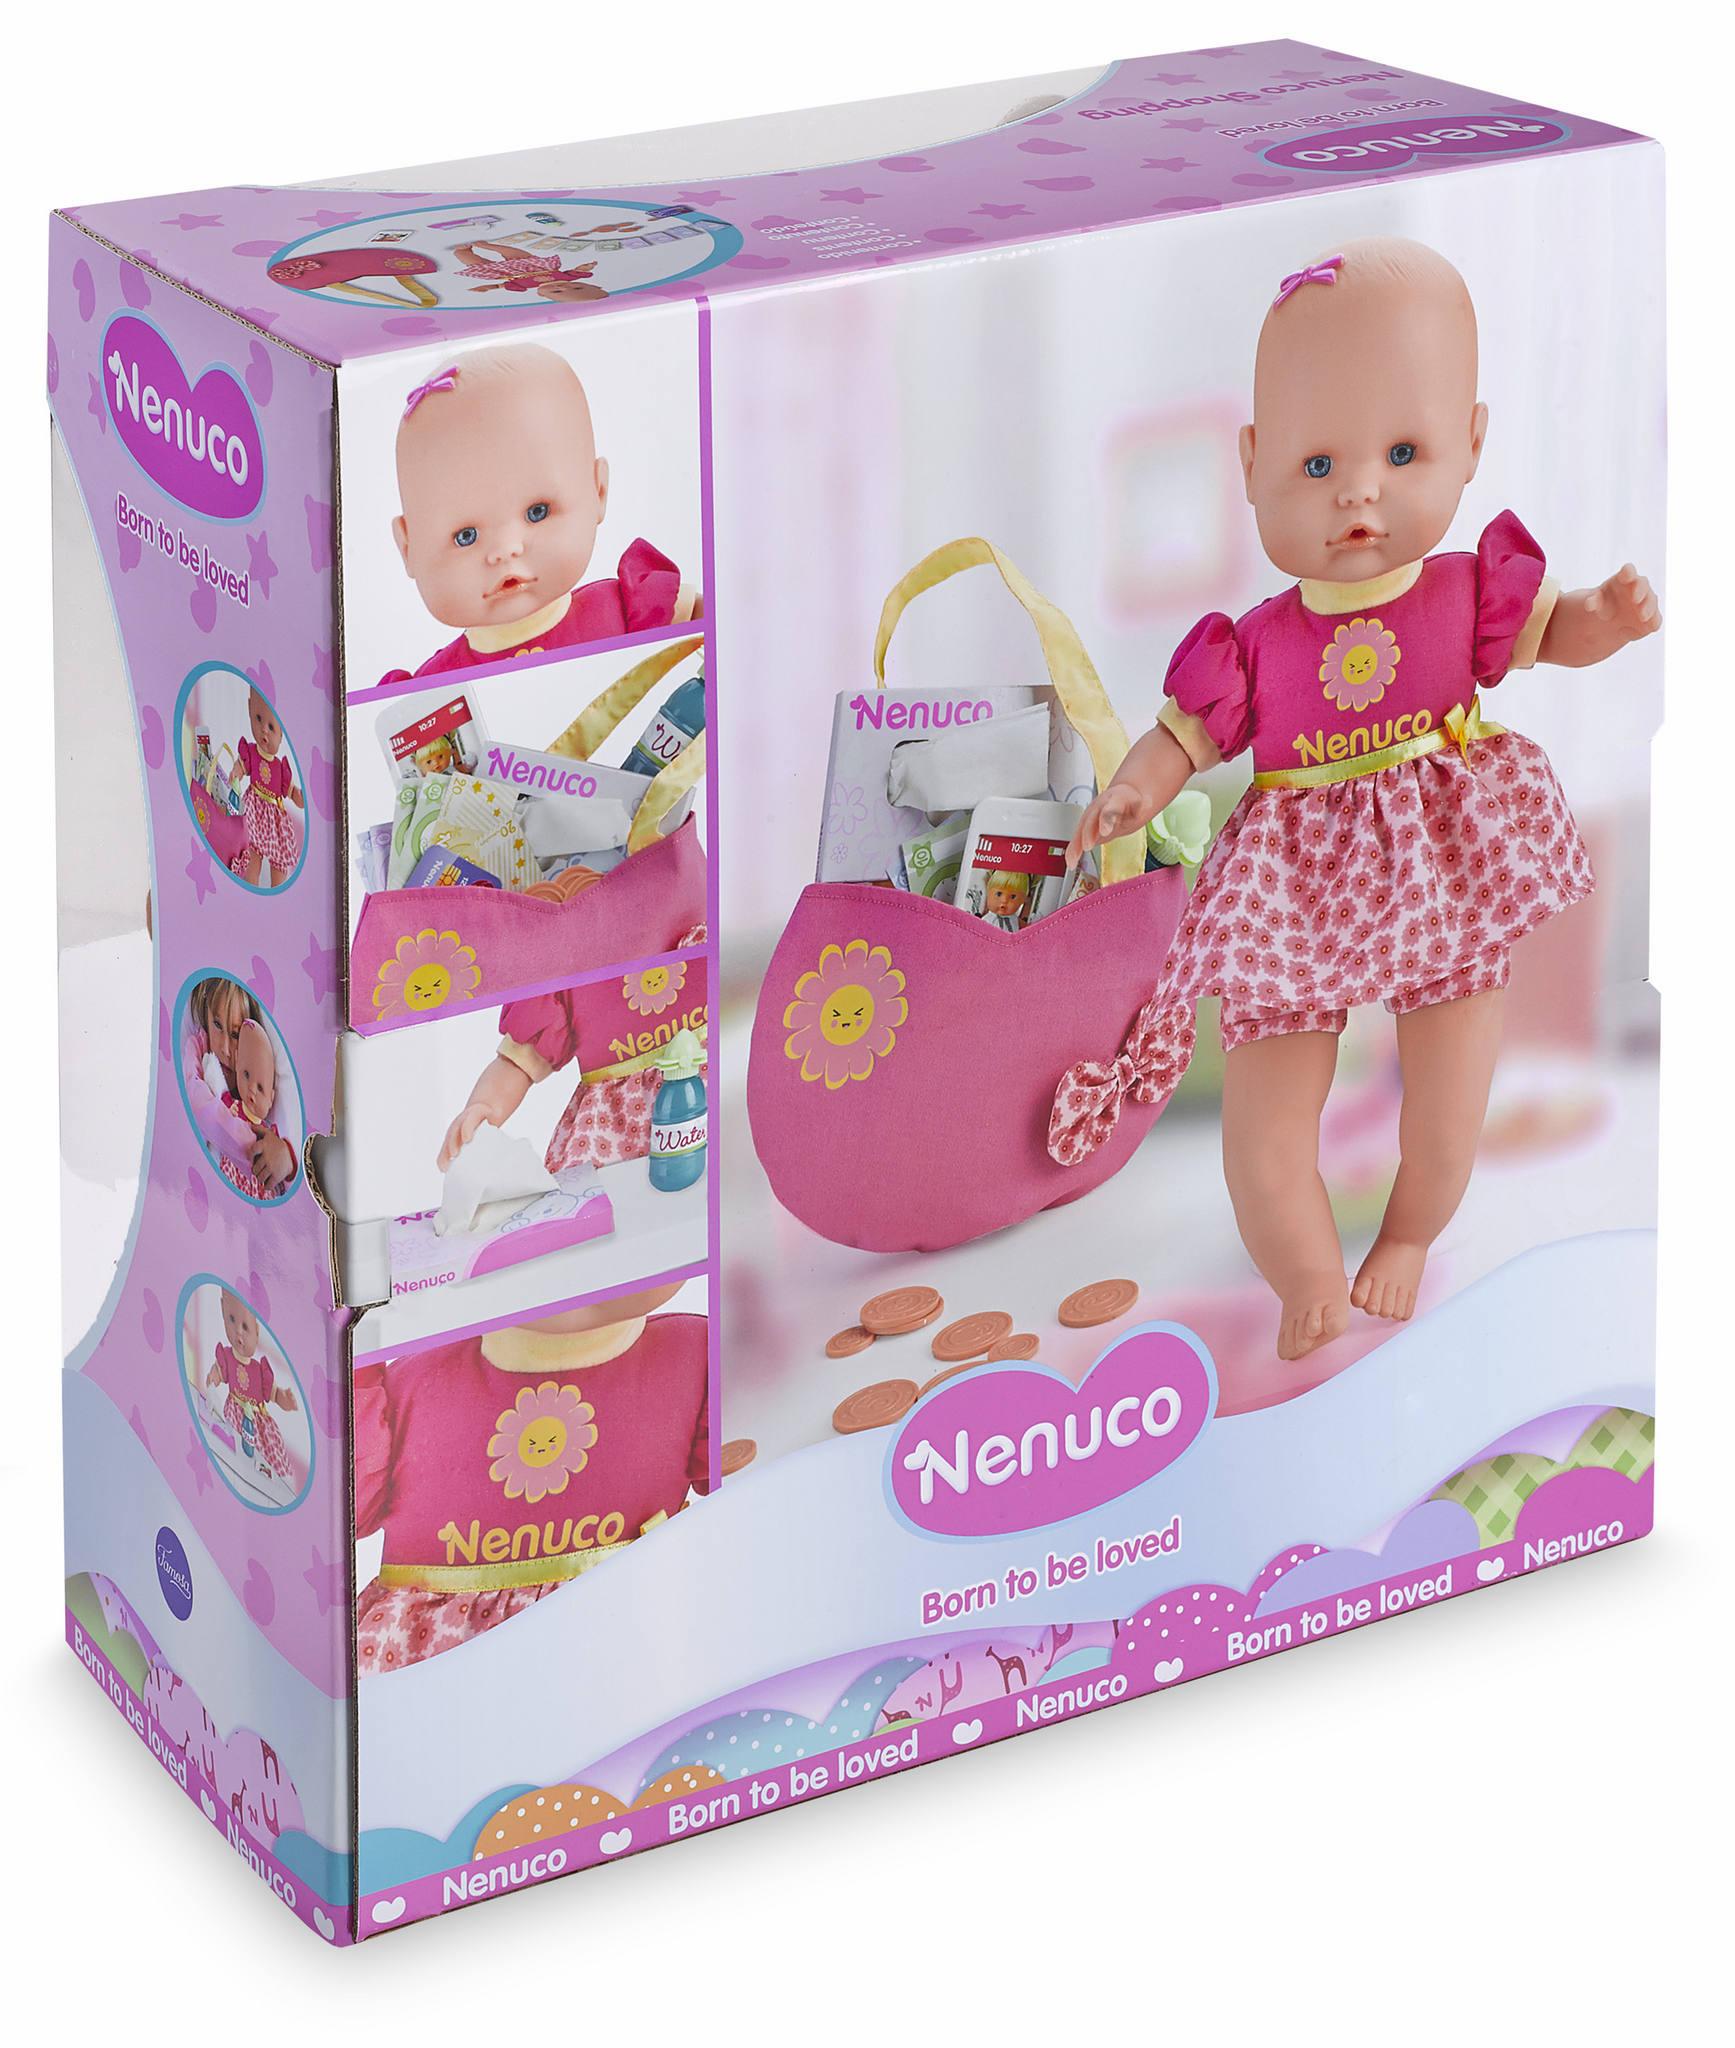 Bambole Nenuco Carrefour